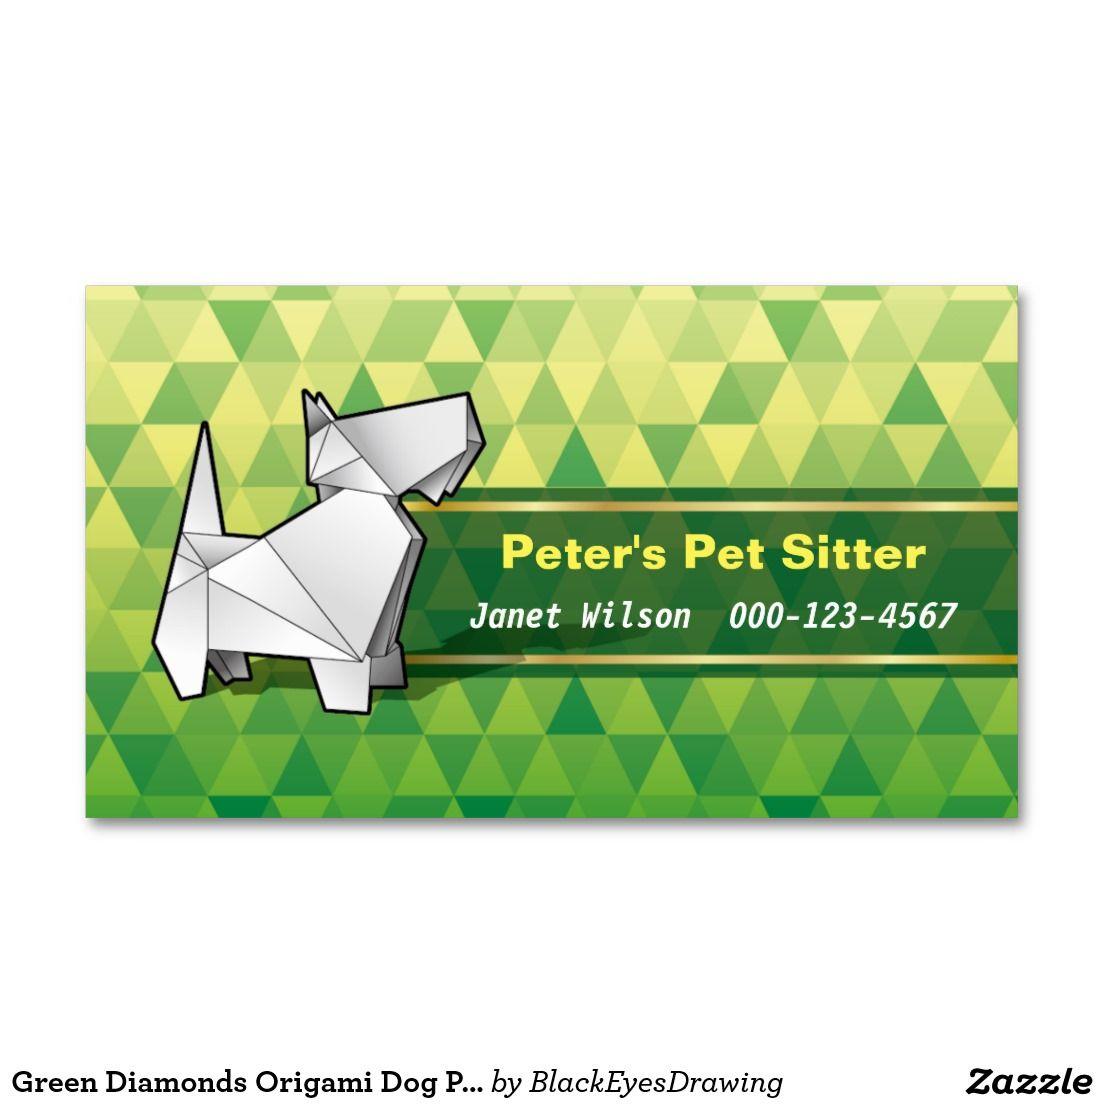 Green Diamonds Origami Dog Pet Sitting Service Business Card | Pet ...